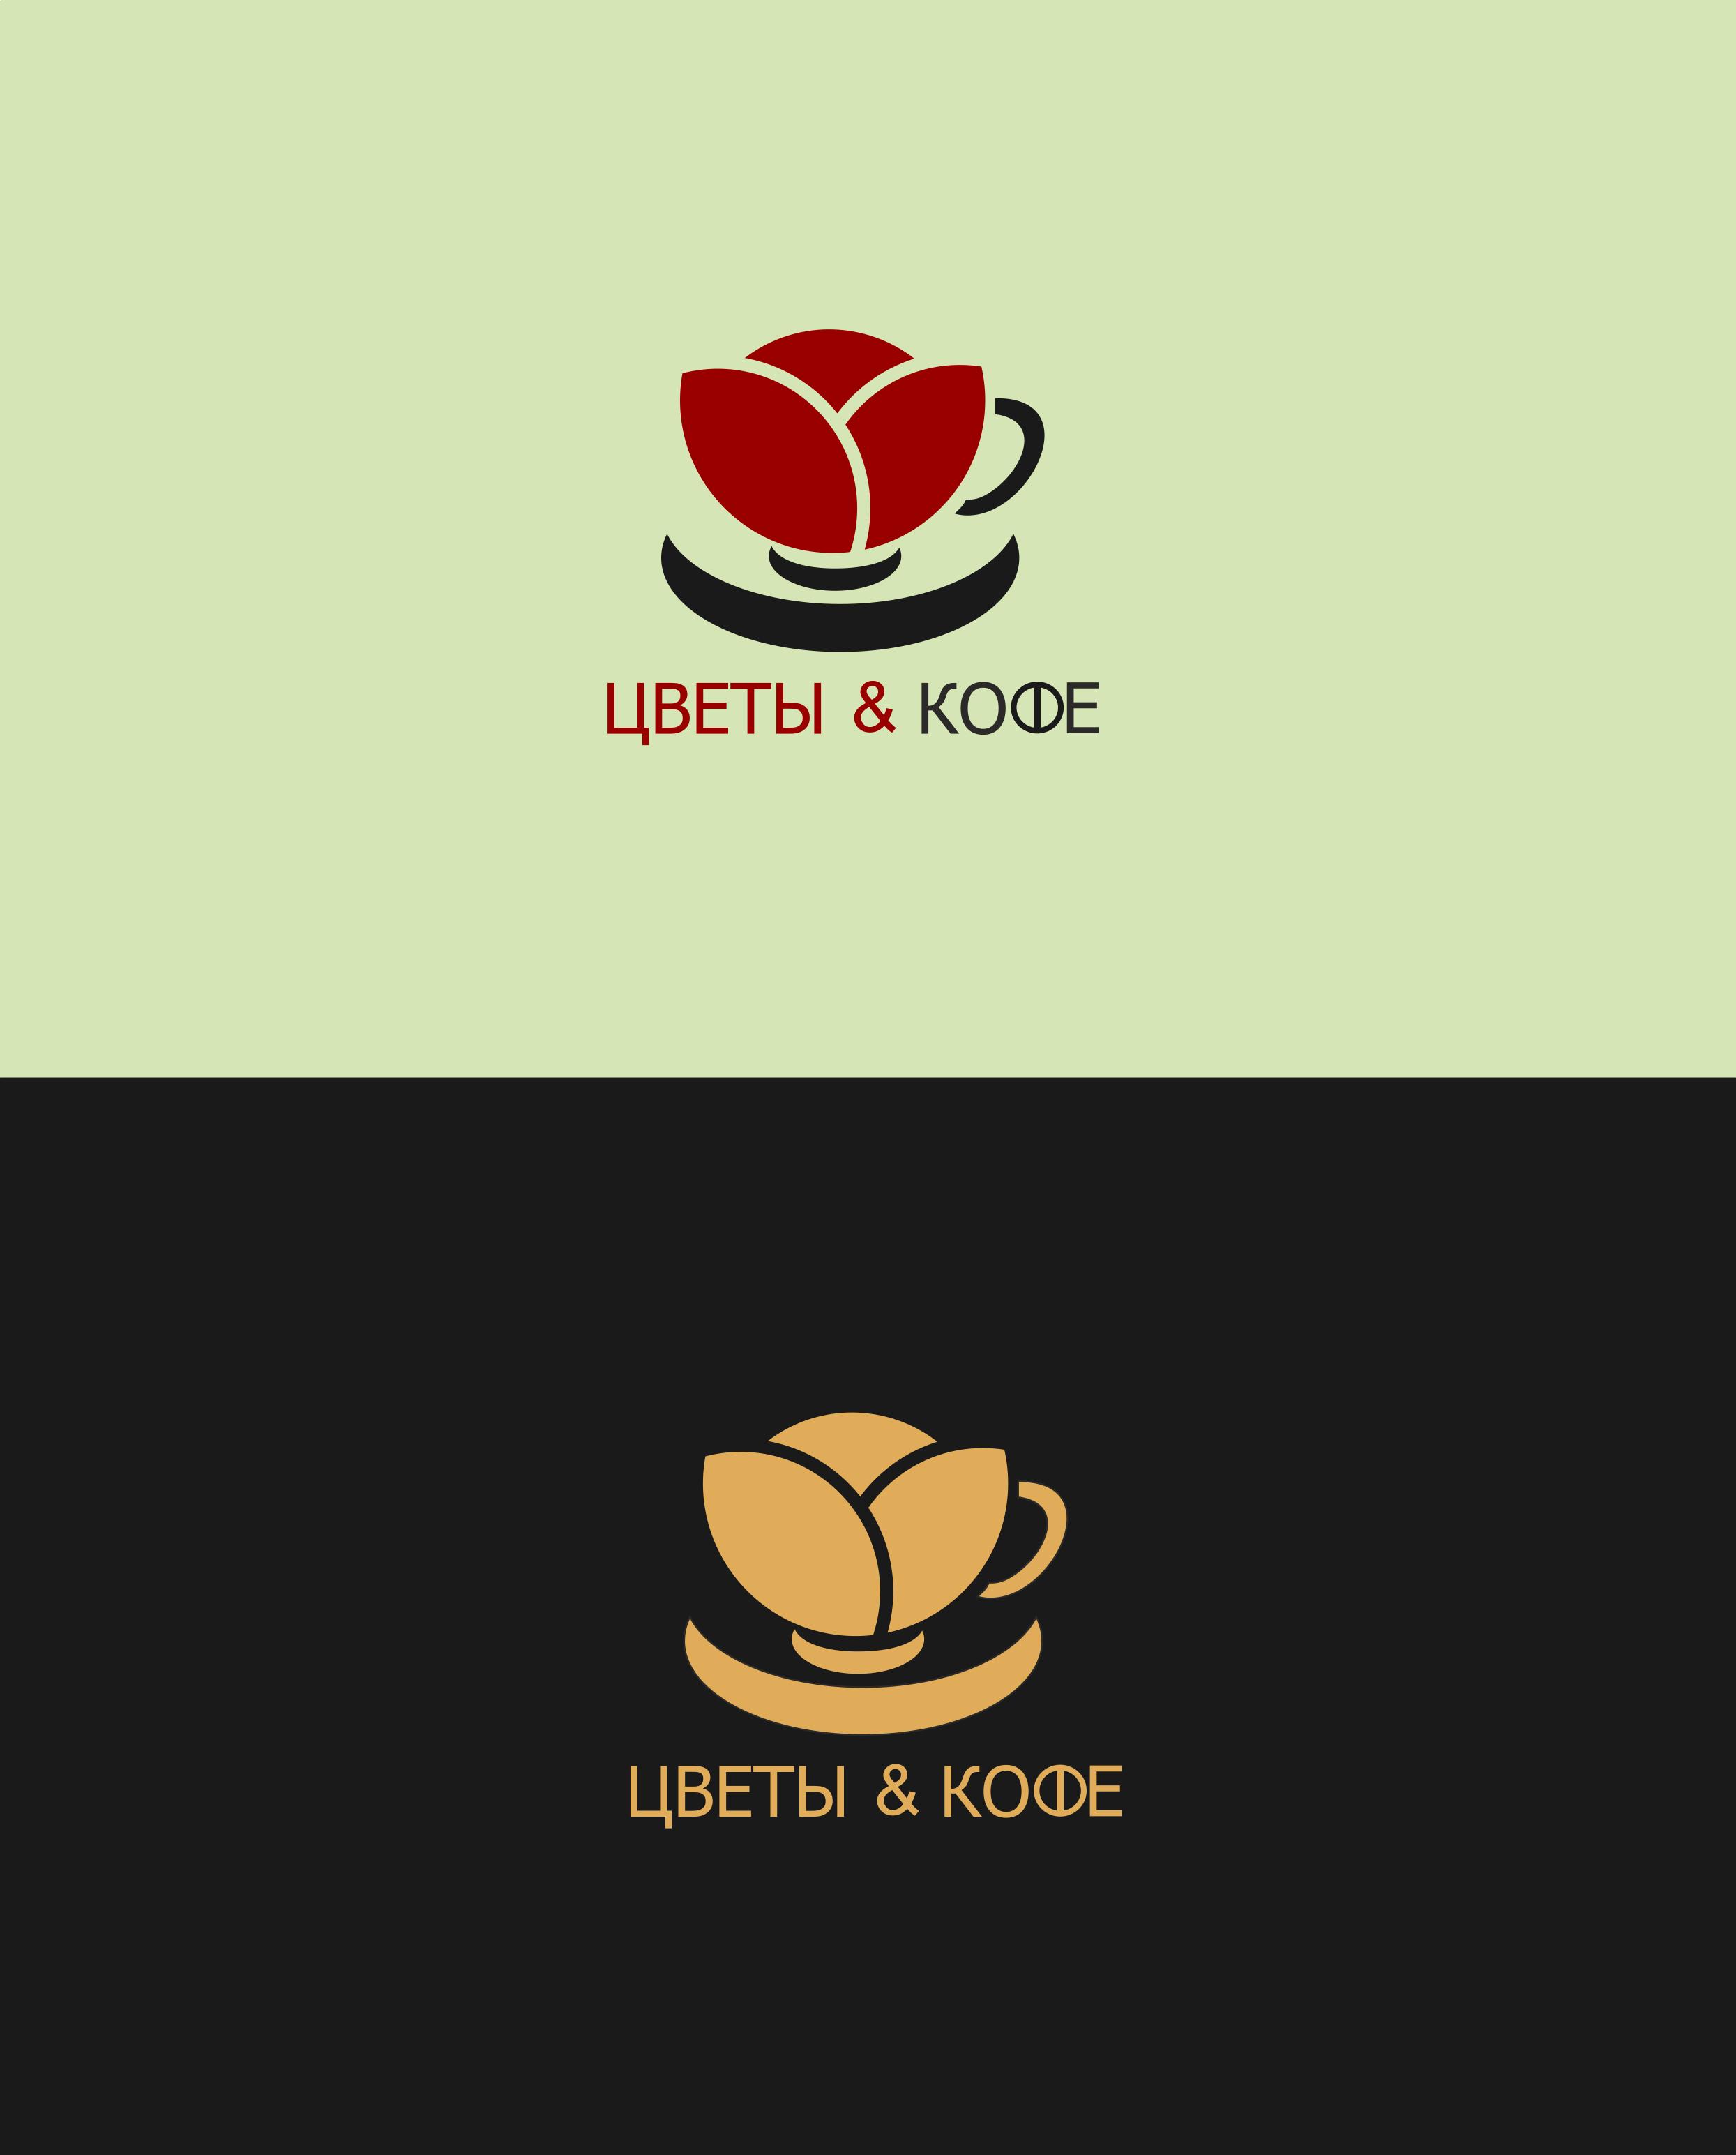 Логотип для ЦВЕТОКОД  фото f_3495d00d5ea521d8.png